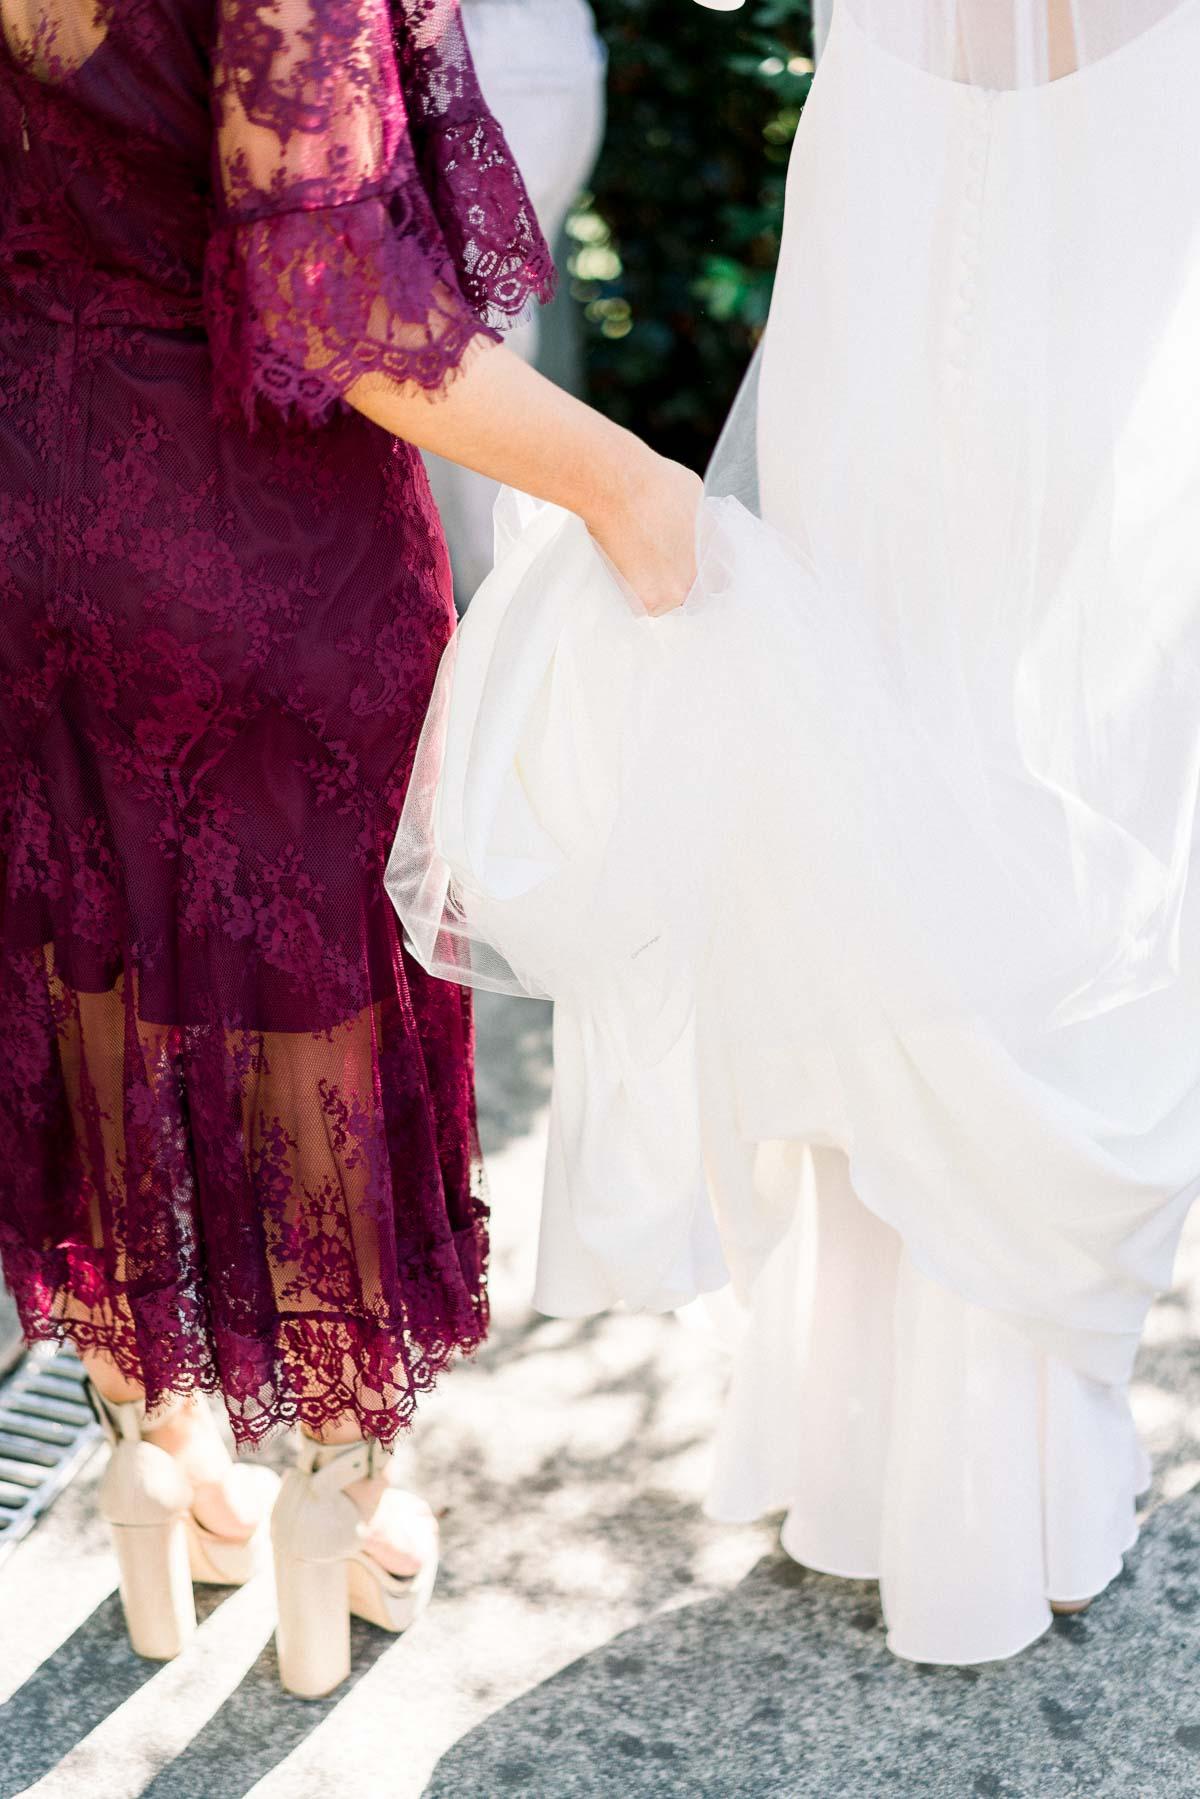 rustic-yarra-valley-wedding-venue-acacia-ridge-georgia-james-07875.jpg